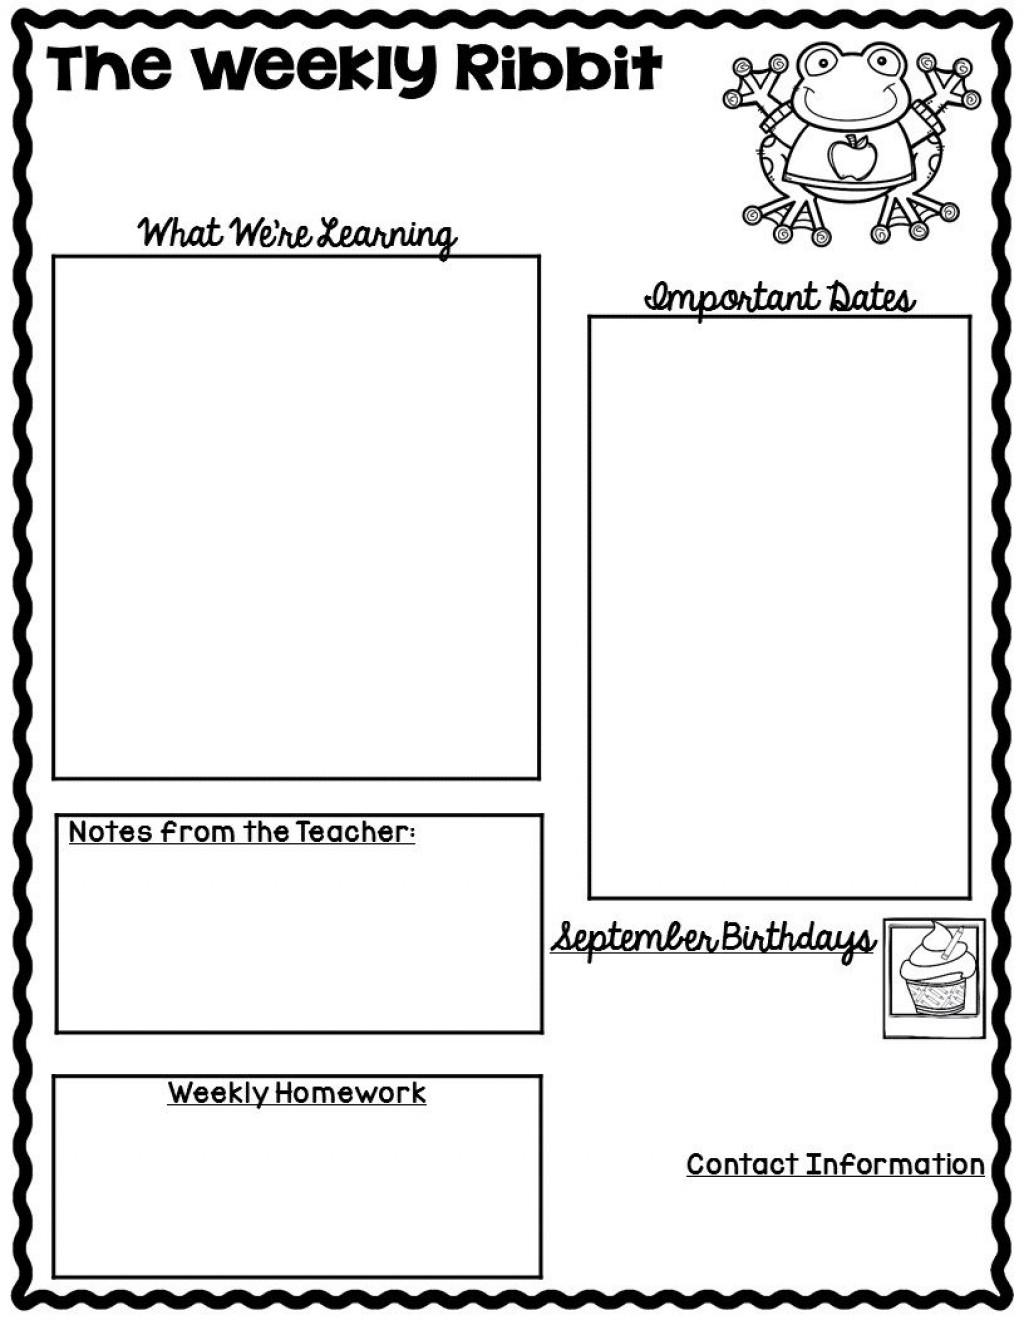 009 Top Newsletter Template For Teacher Highest Quality  Teachers To Parent Free Printable DigitalLarge